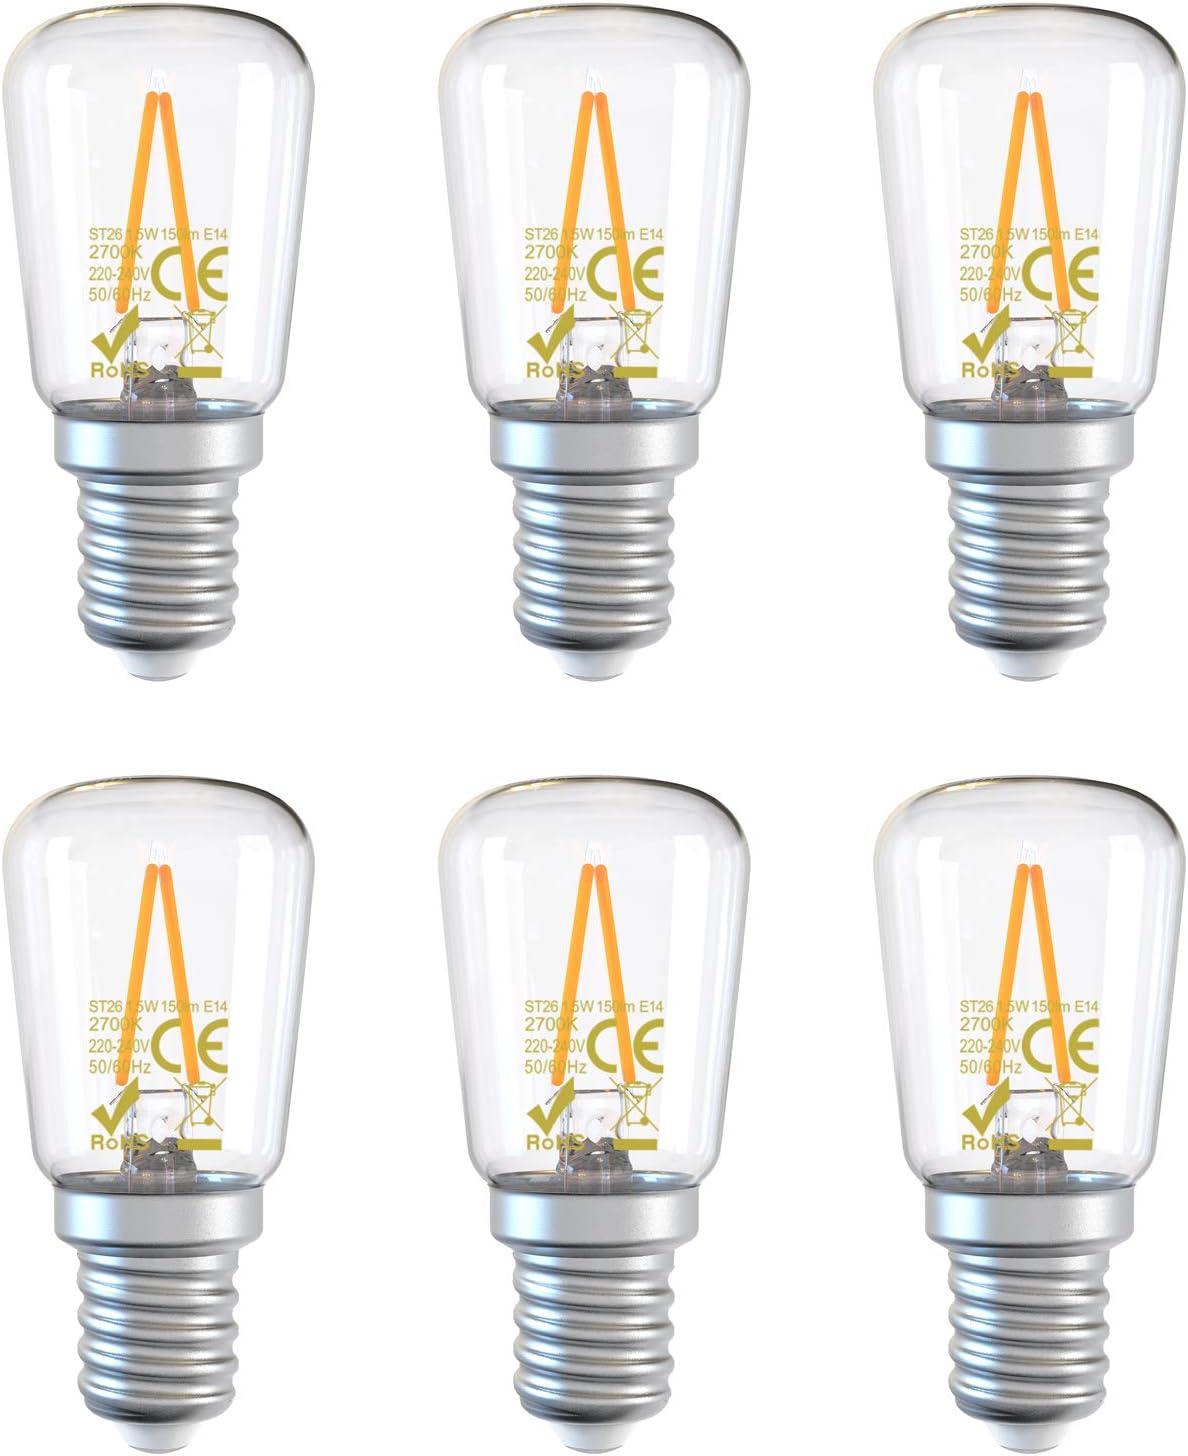 DGE E14 1.5W=15W Bombillas Filamento LED,150Lm 2700K LED Bombillas Refrigerador/Campana Extractora, No Regulable,Paquete de 6[Clase Eficiencia Energética A++]